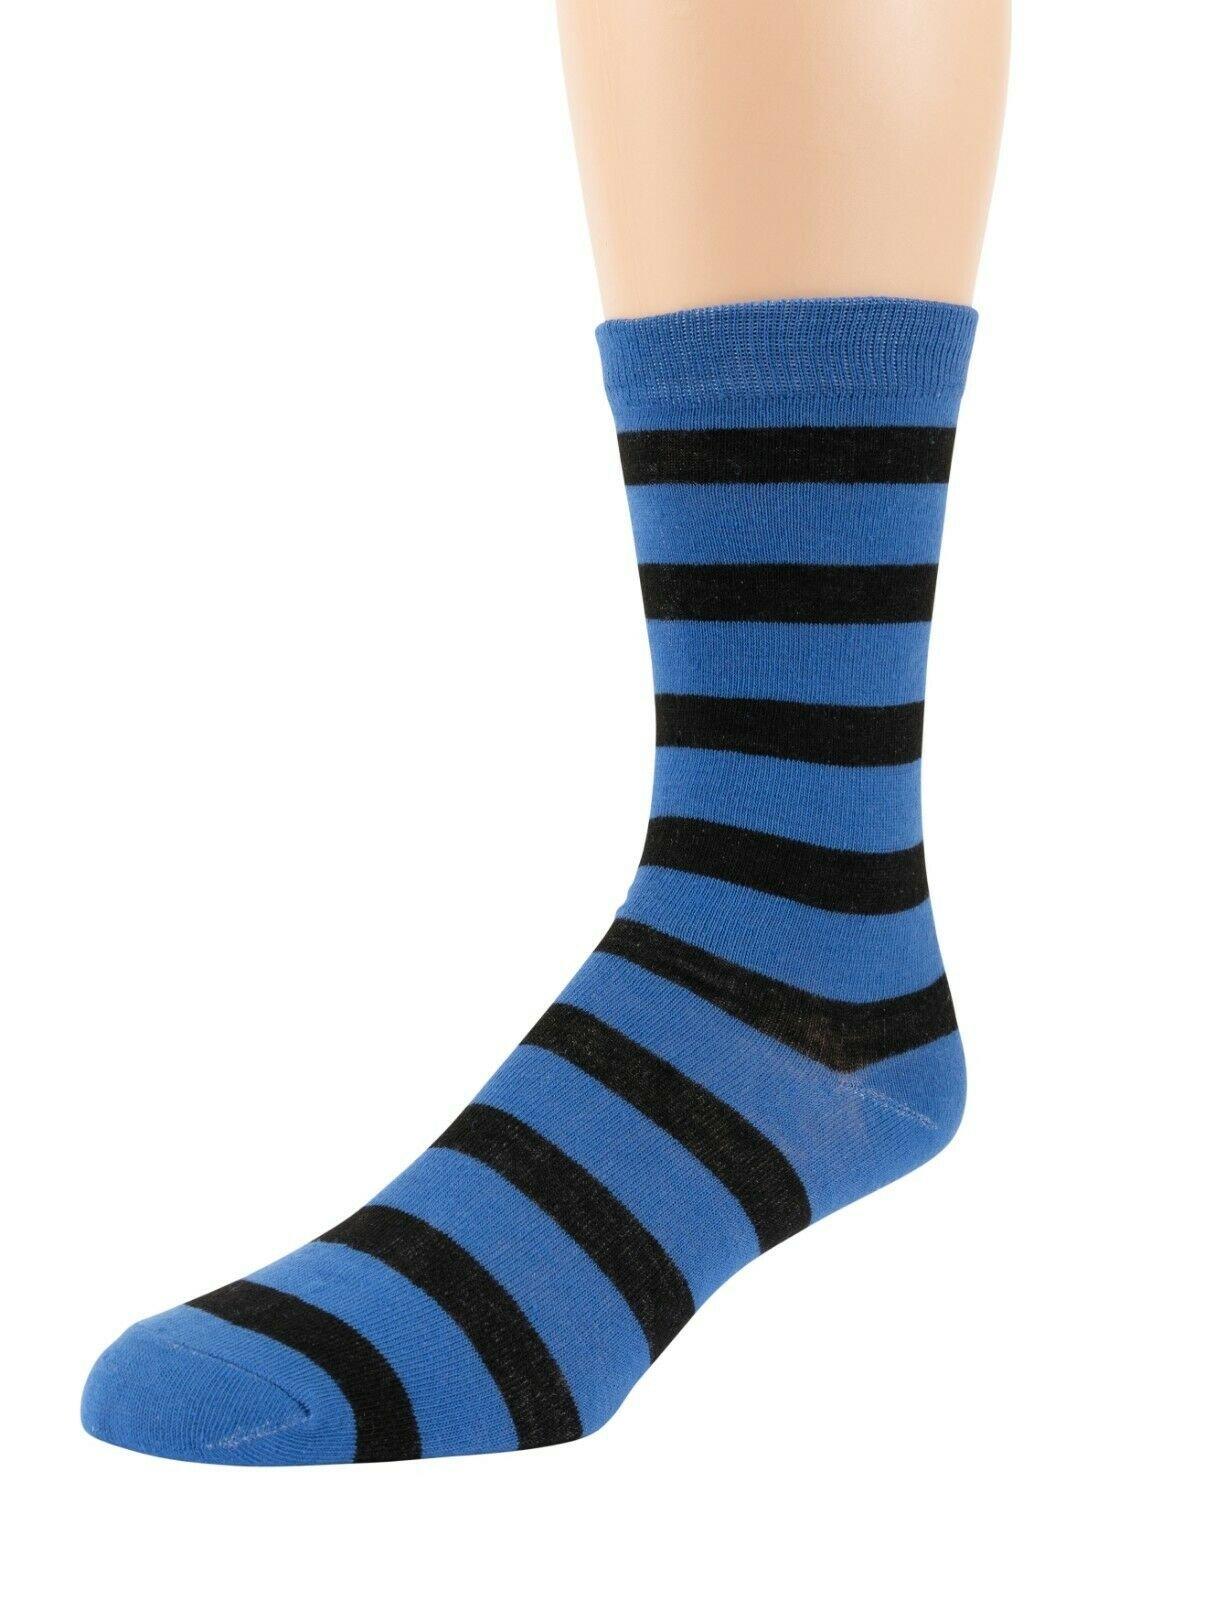 Mitch-Bogen-Mens-Cotton-Dress-Socks-Colorful-Fashion-Crew-Socks-8-Pack-Gift-Box thumbnail 34